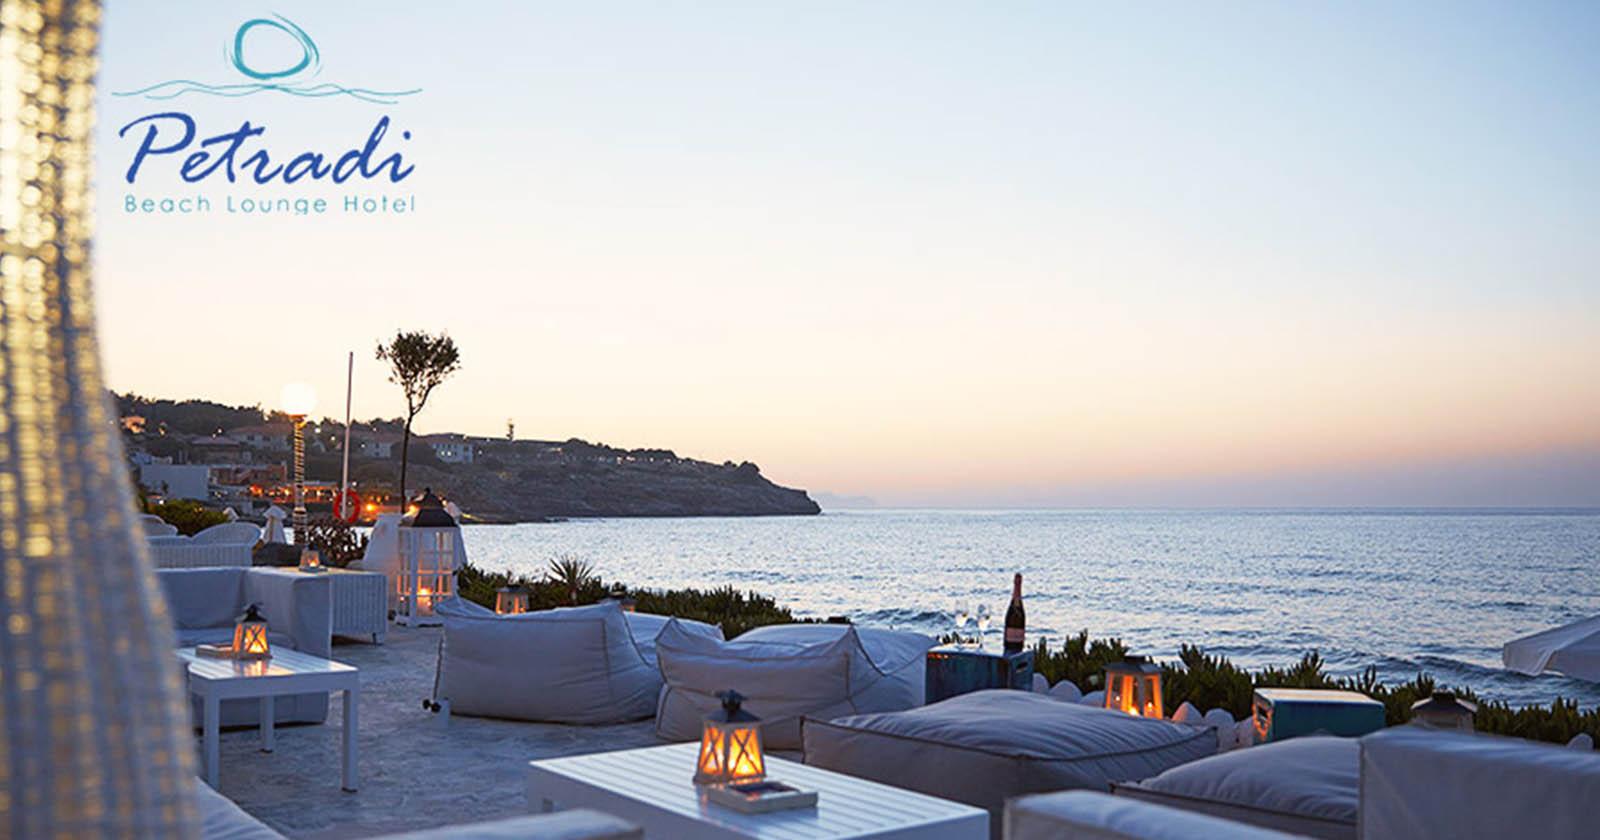 Hotel Keys – Petradi Beach Lounge Hotel (17)